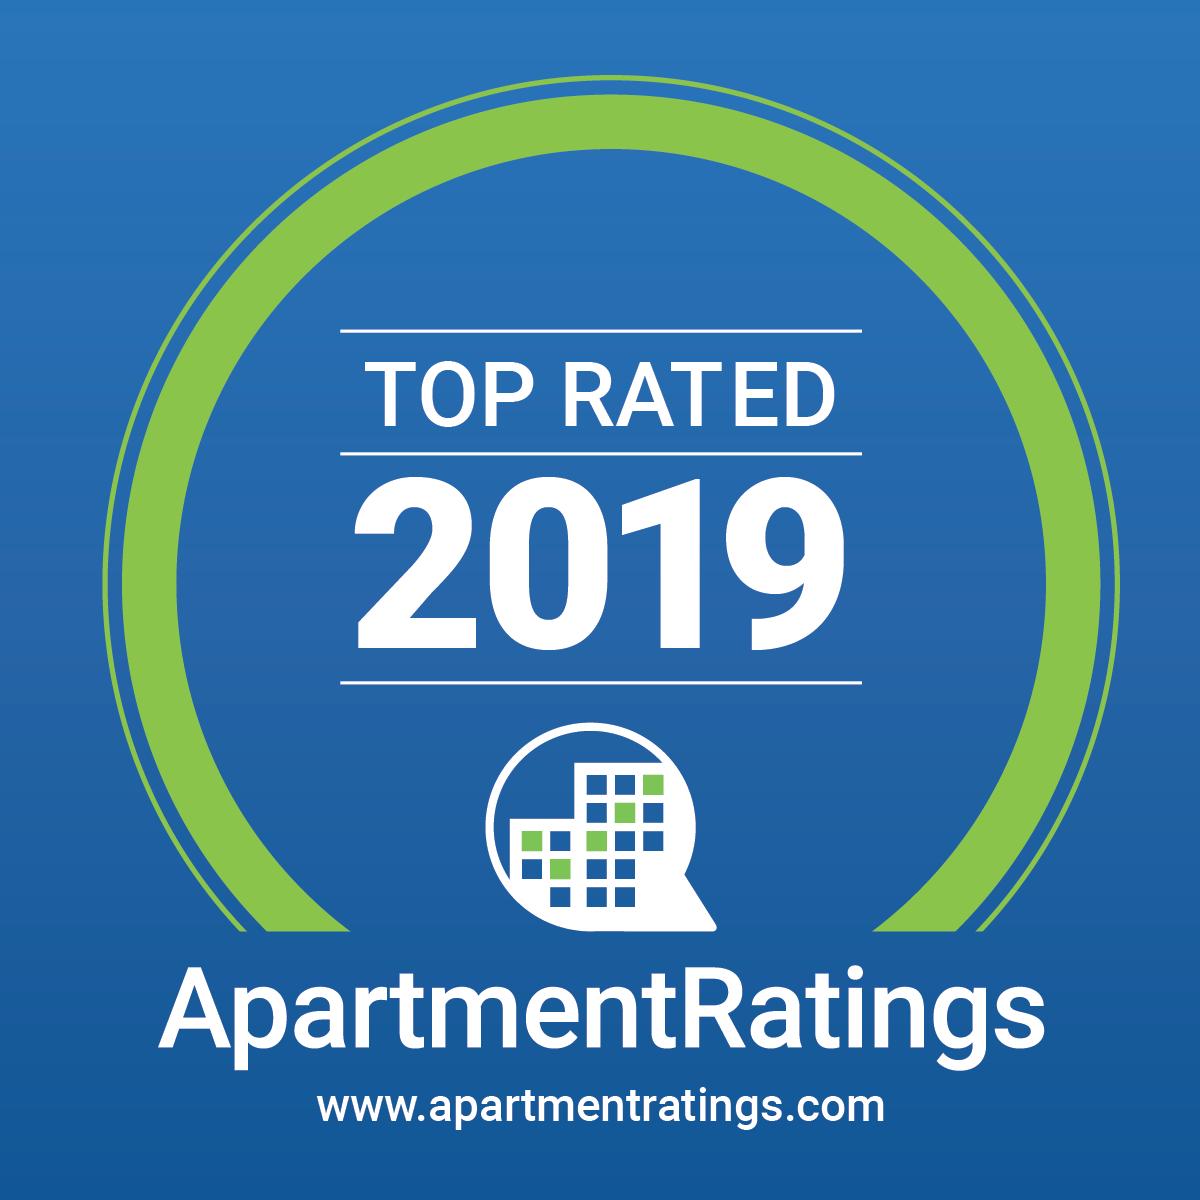 Renaissance Place Garners Top Rated Apartments Award-image